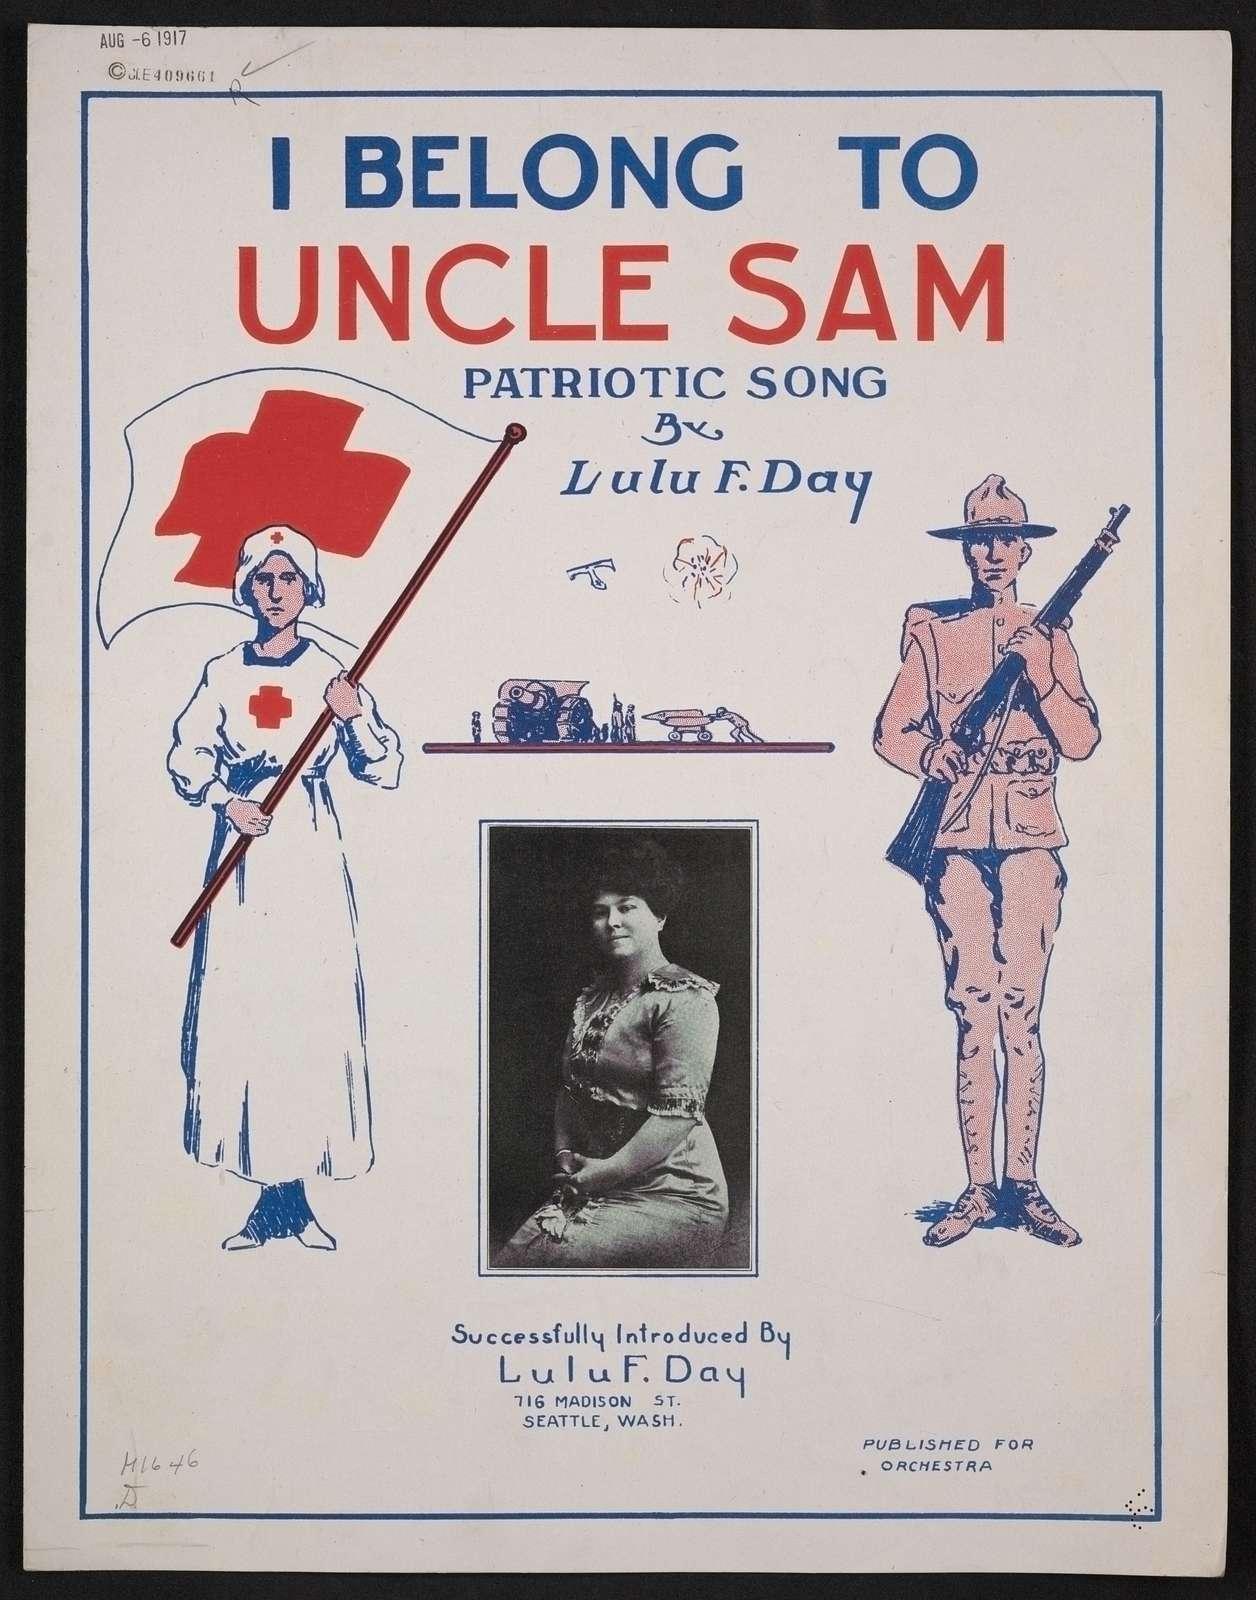 I belong to Uncle Sam patriotic song